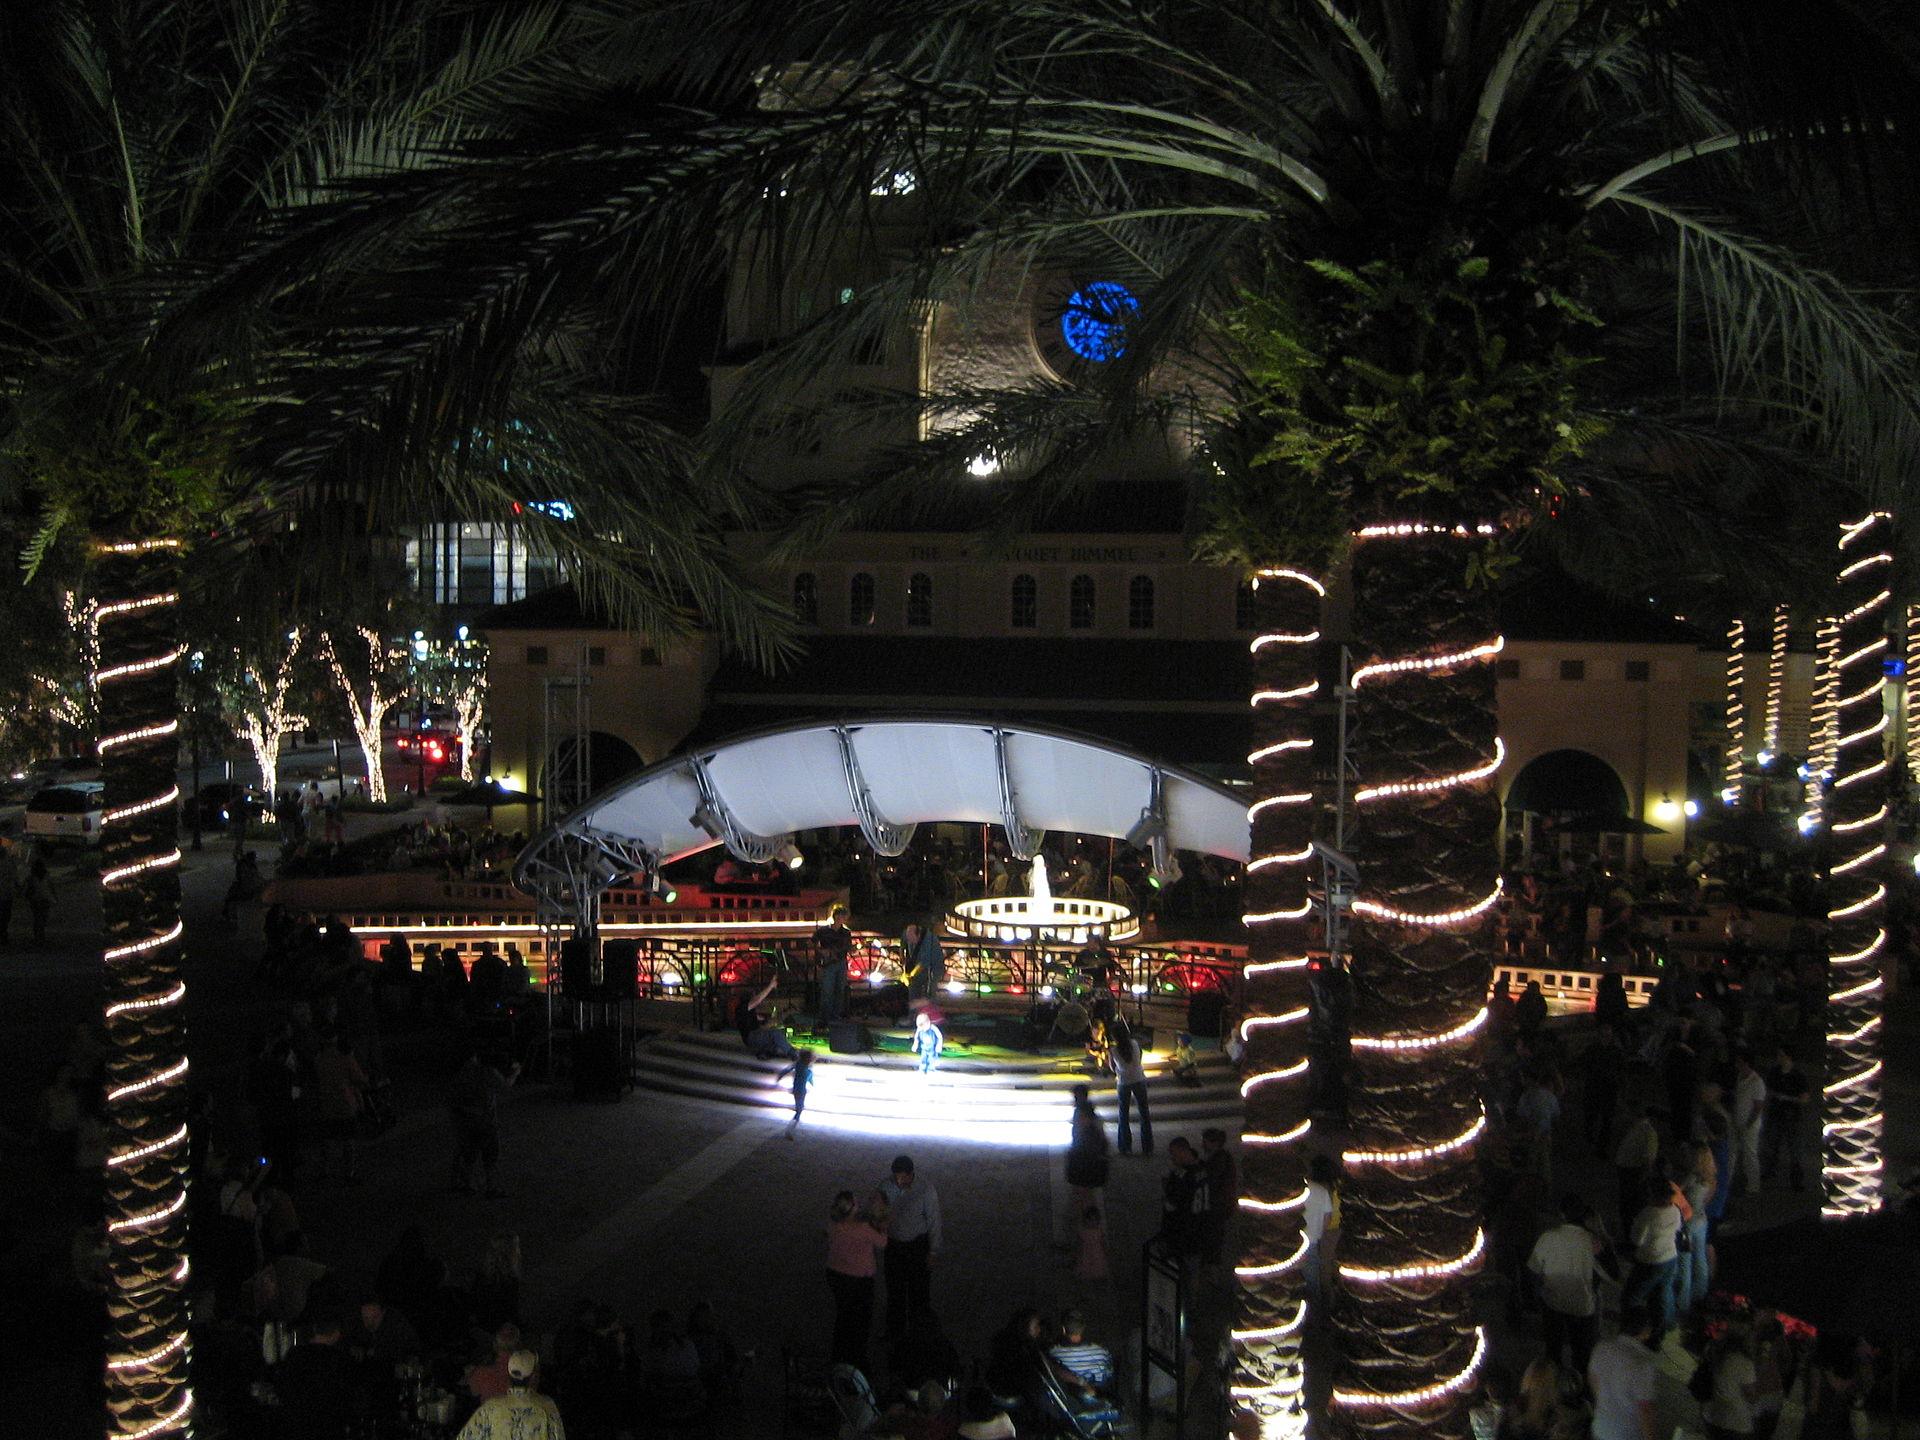 cityplace west palm beach wikipedia